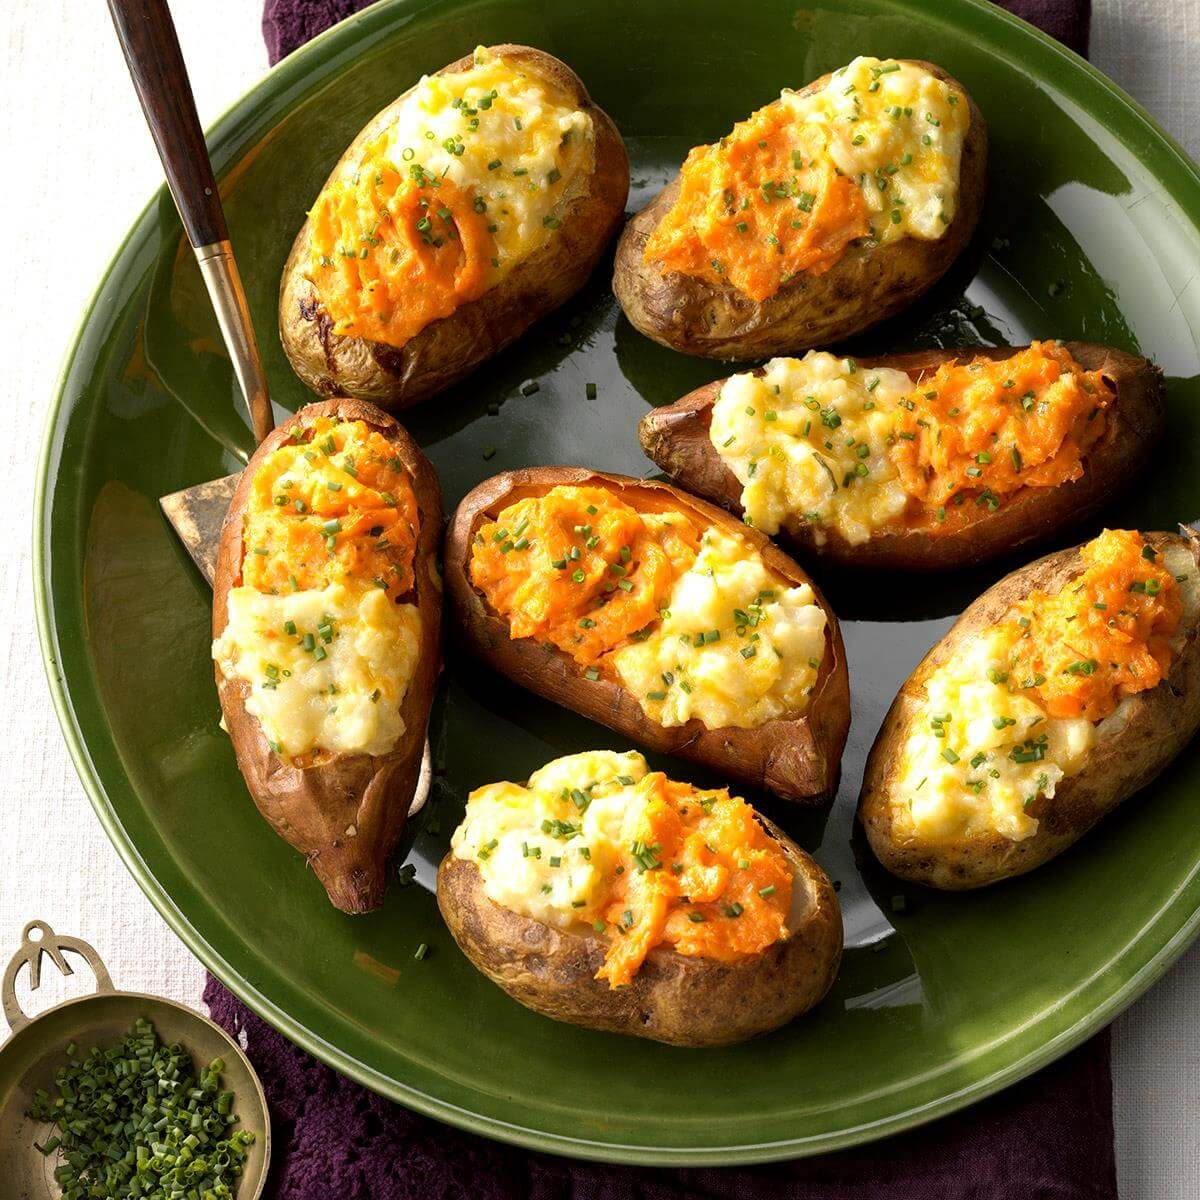 Nebraska: Two-Tone Baked Potatoes